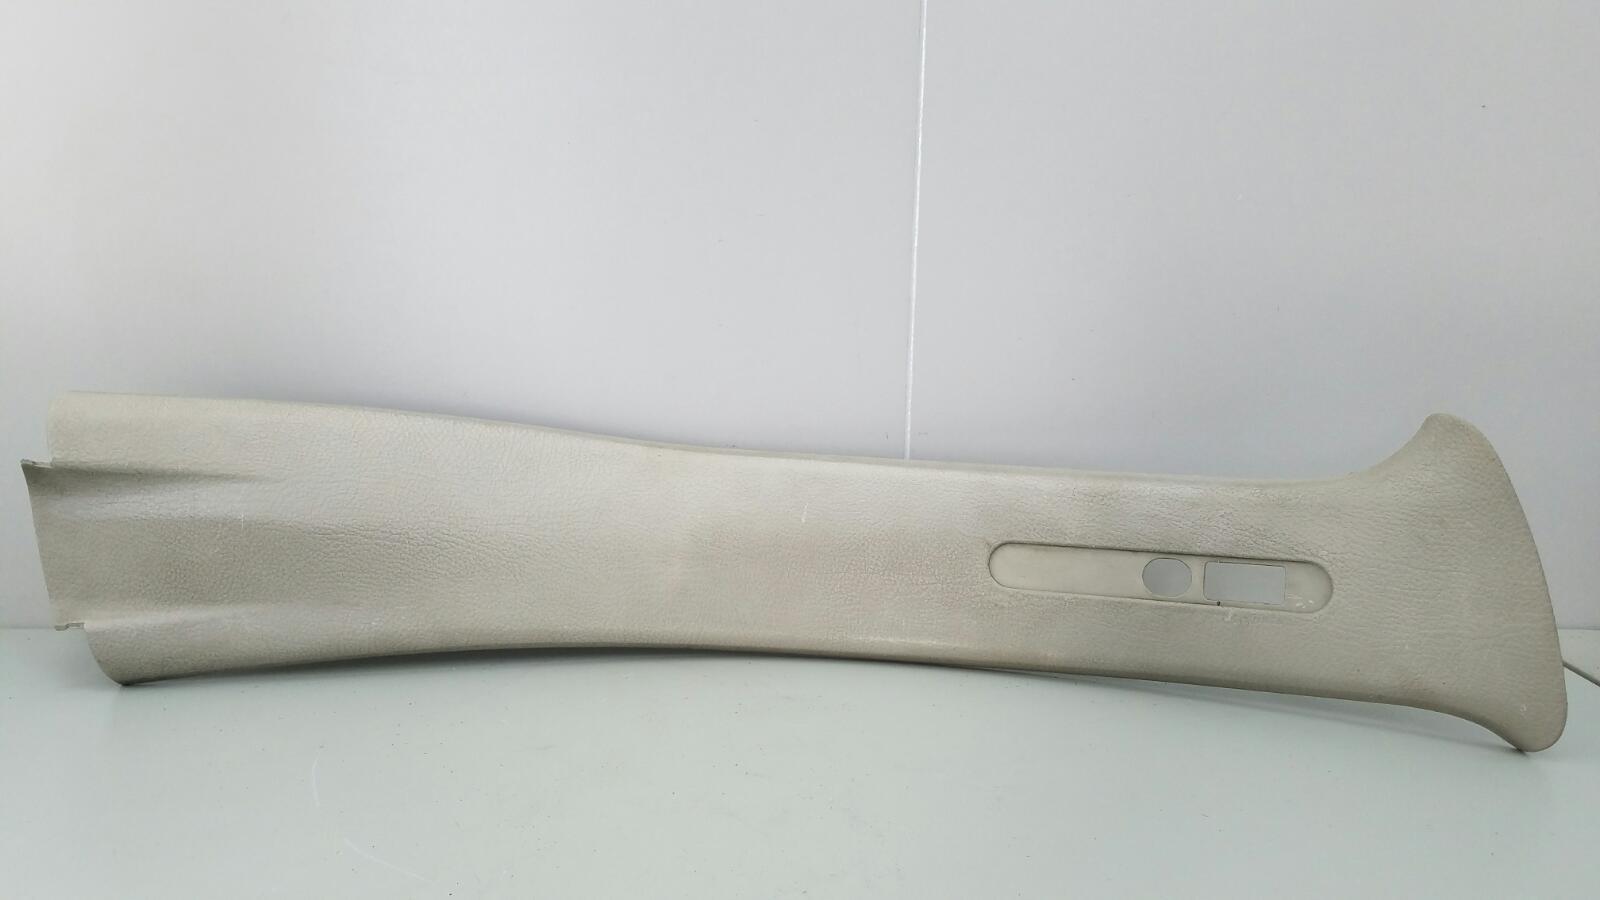 Накладка средней стойки Peugeot 206 KFW (TU3JP) 1.4Л 2007 правая